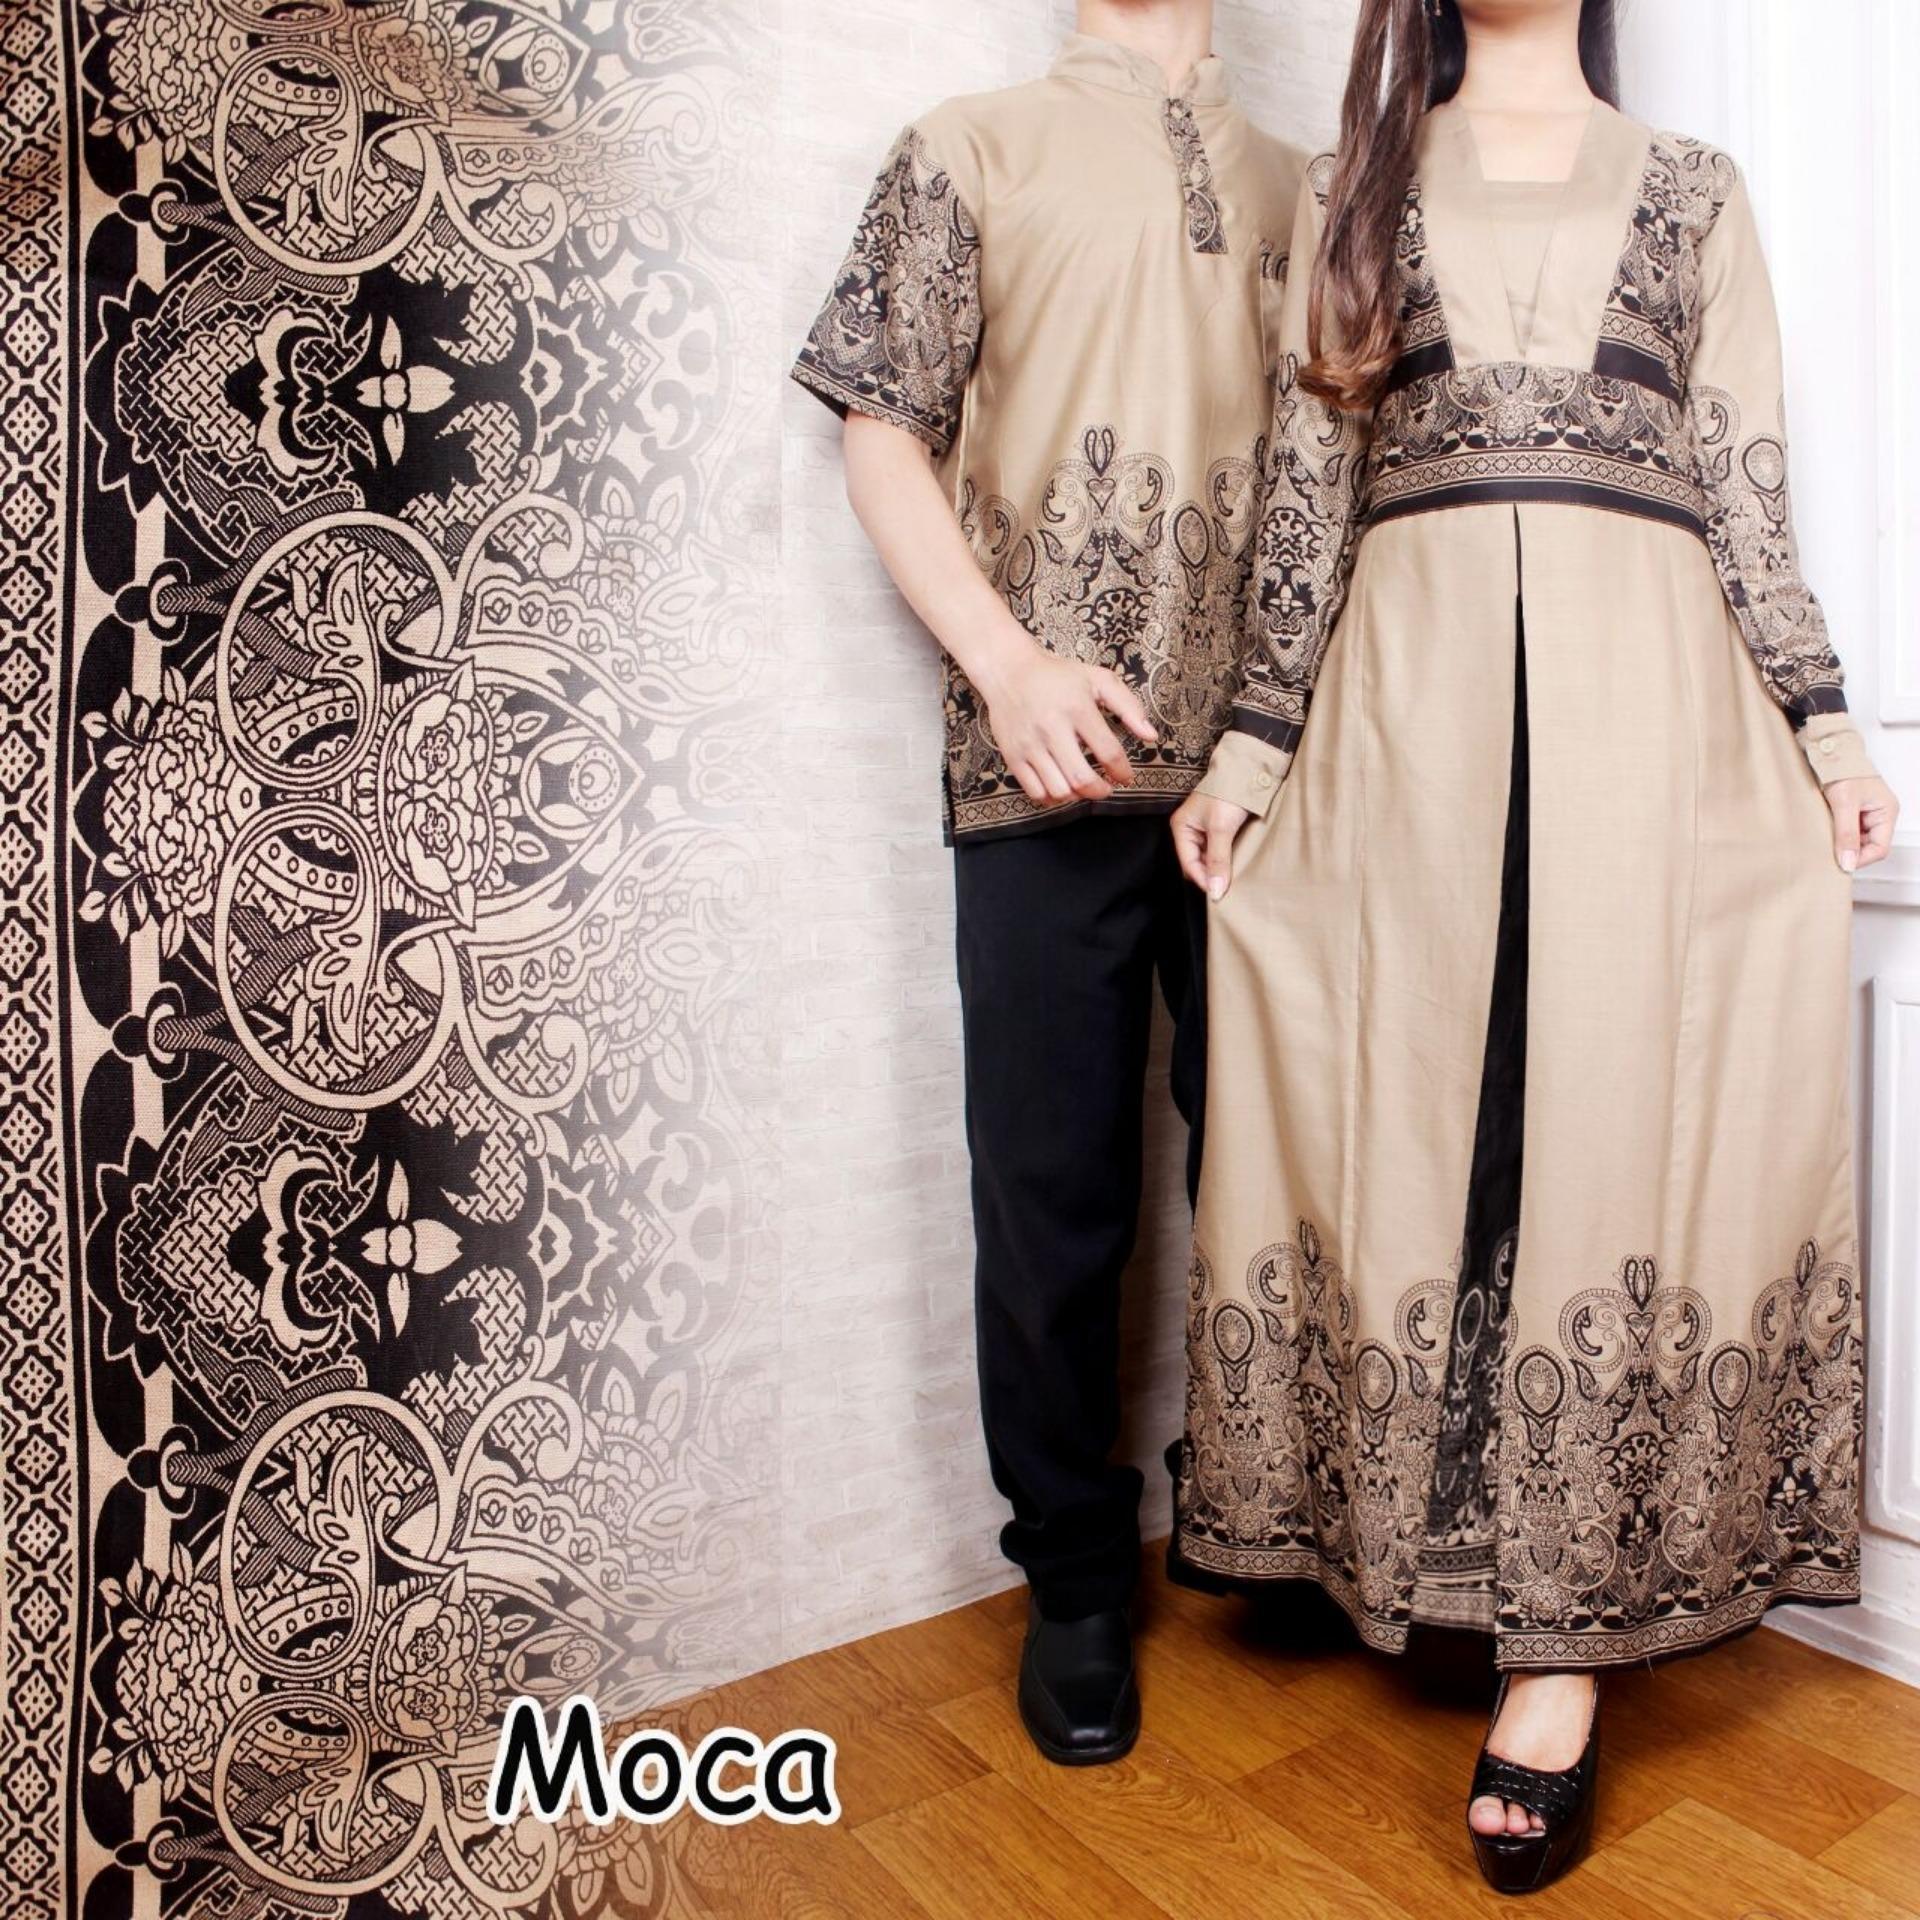 Desain trendi Flavia Store Batik Couple FS0067 - MOCCA / Sarimbit / Baju Muslim Pasangan / Sepasang Busana